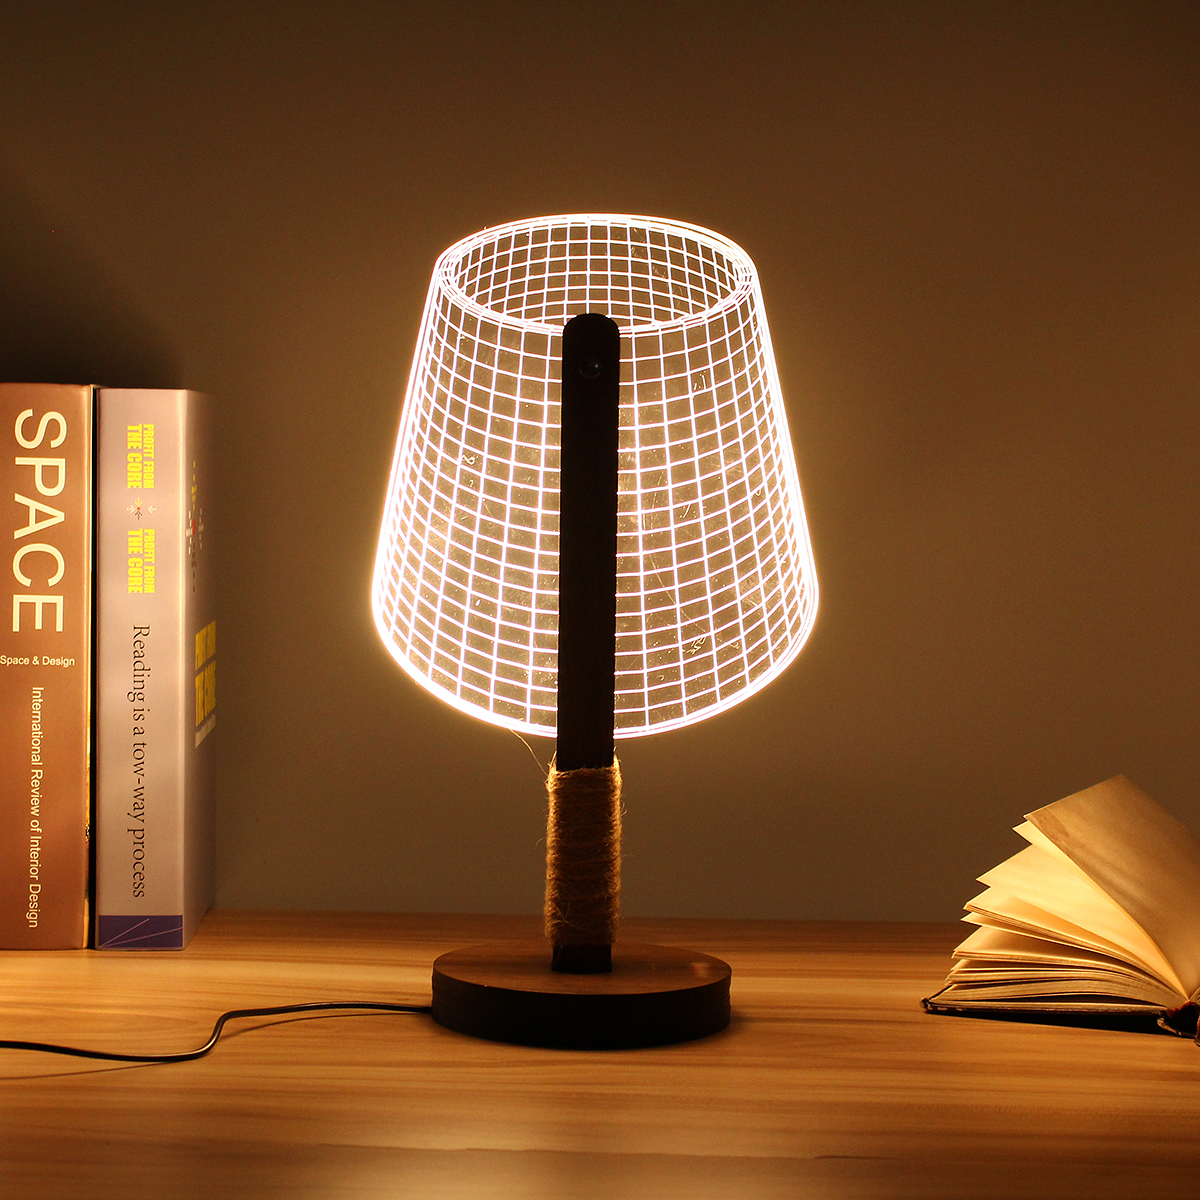 1Pcs Handmade 3D Wooden Stand Lamp Night Light Bedside Table Desk Lamp Plug Connector Home Decor Lighting